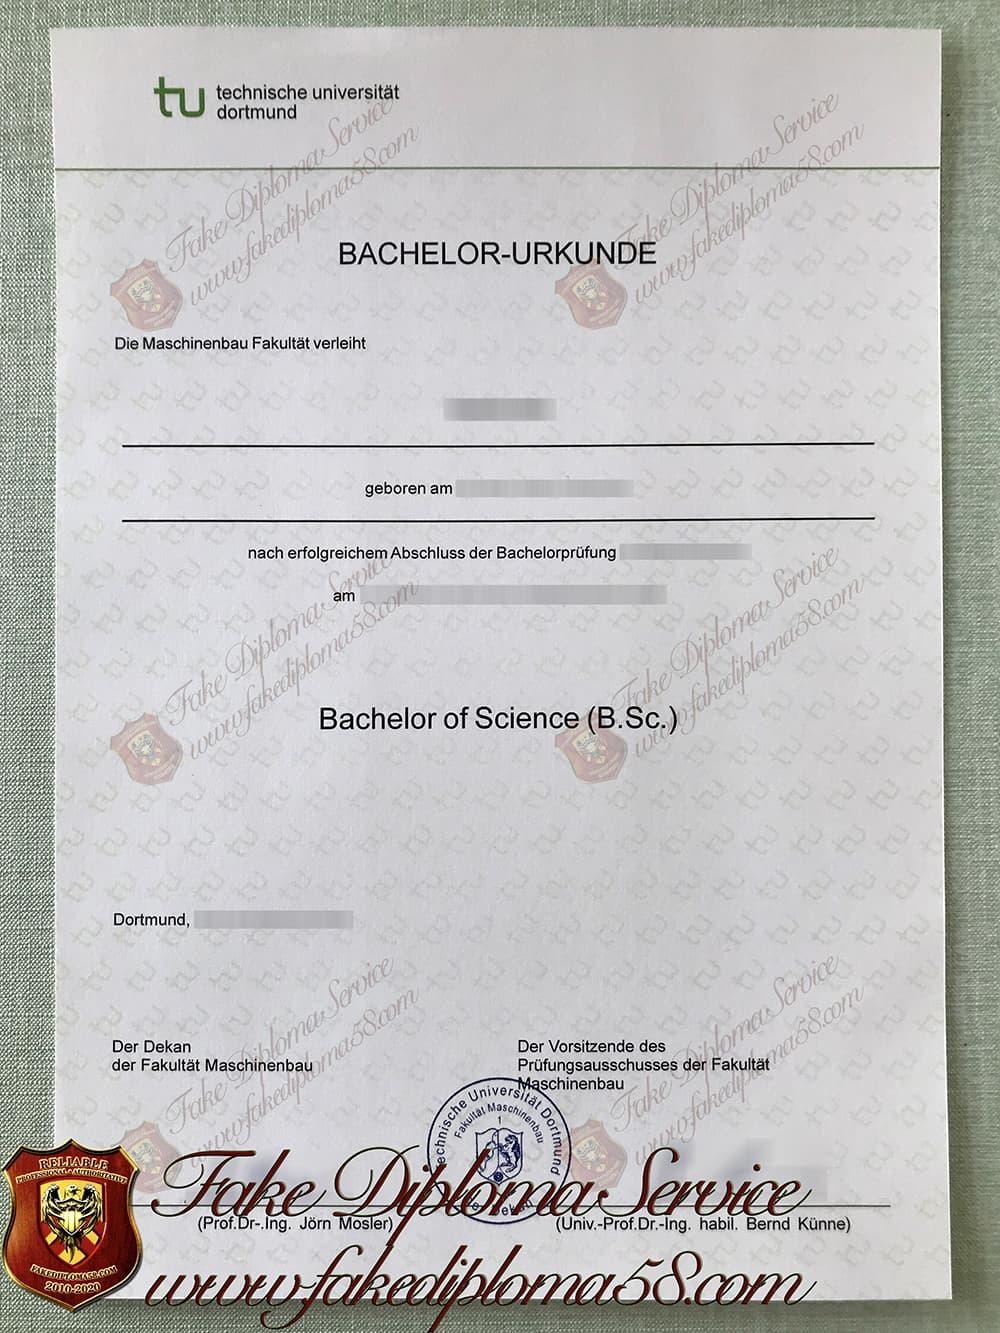 fake Dortmund university of technology diploma